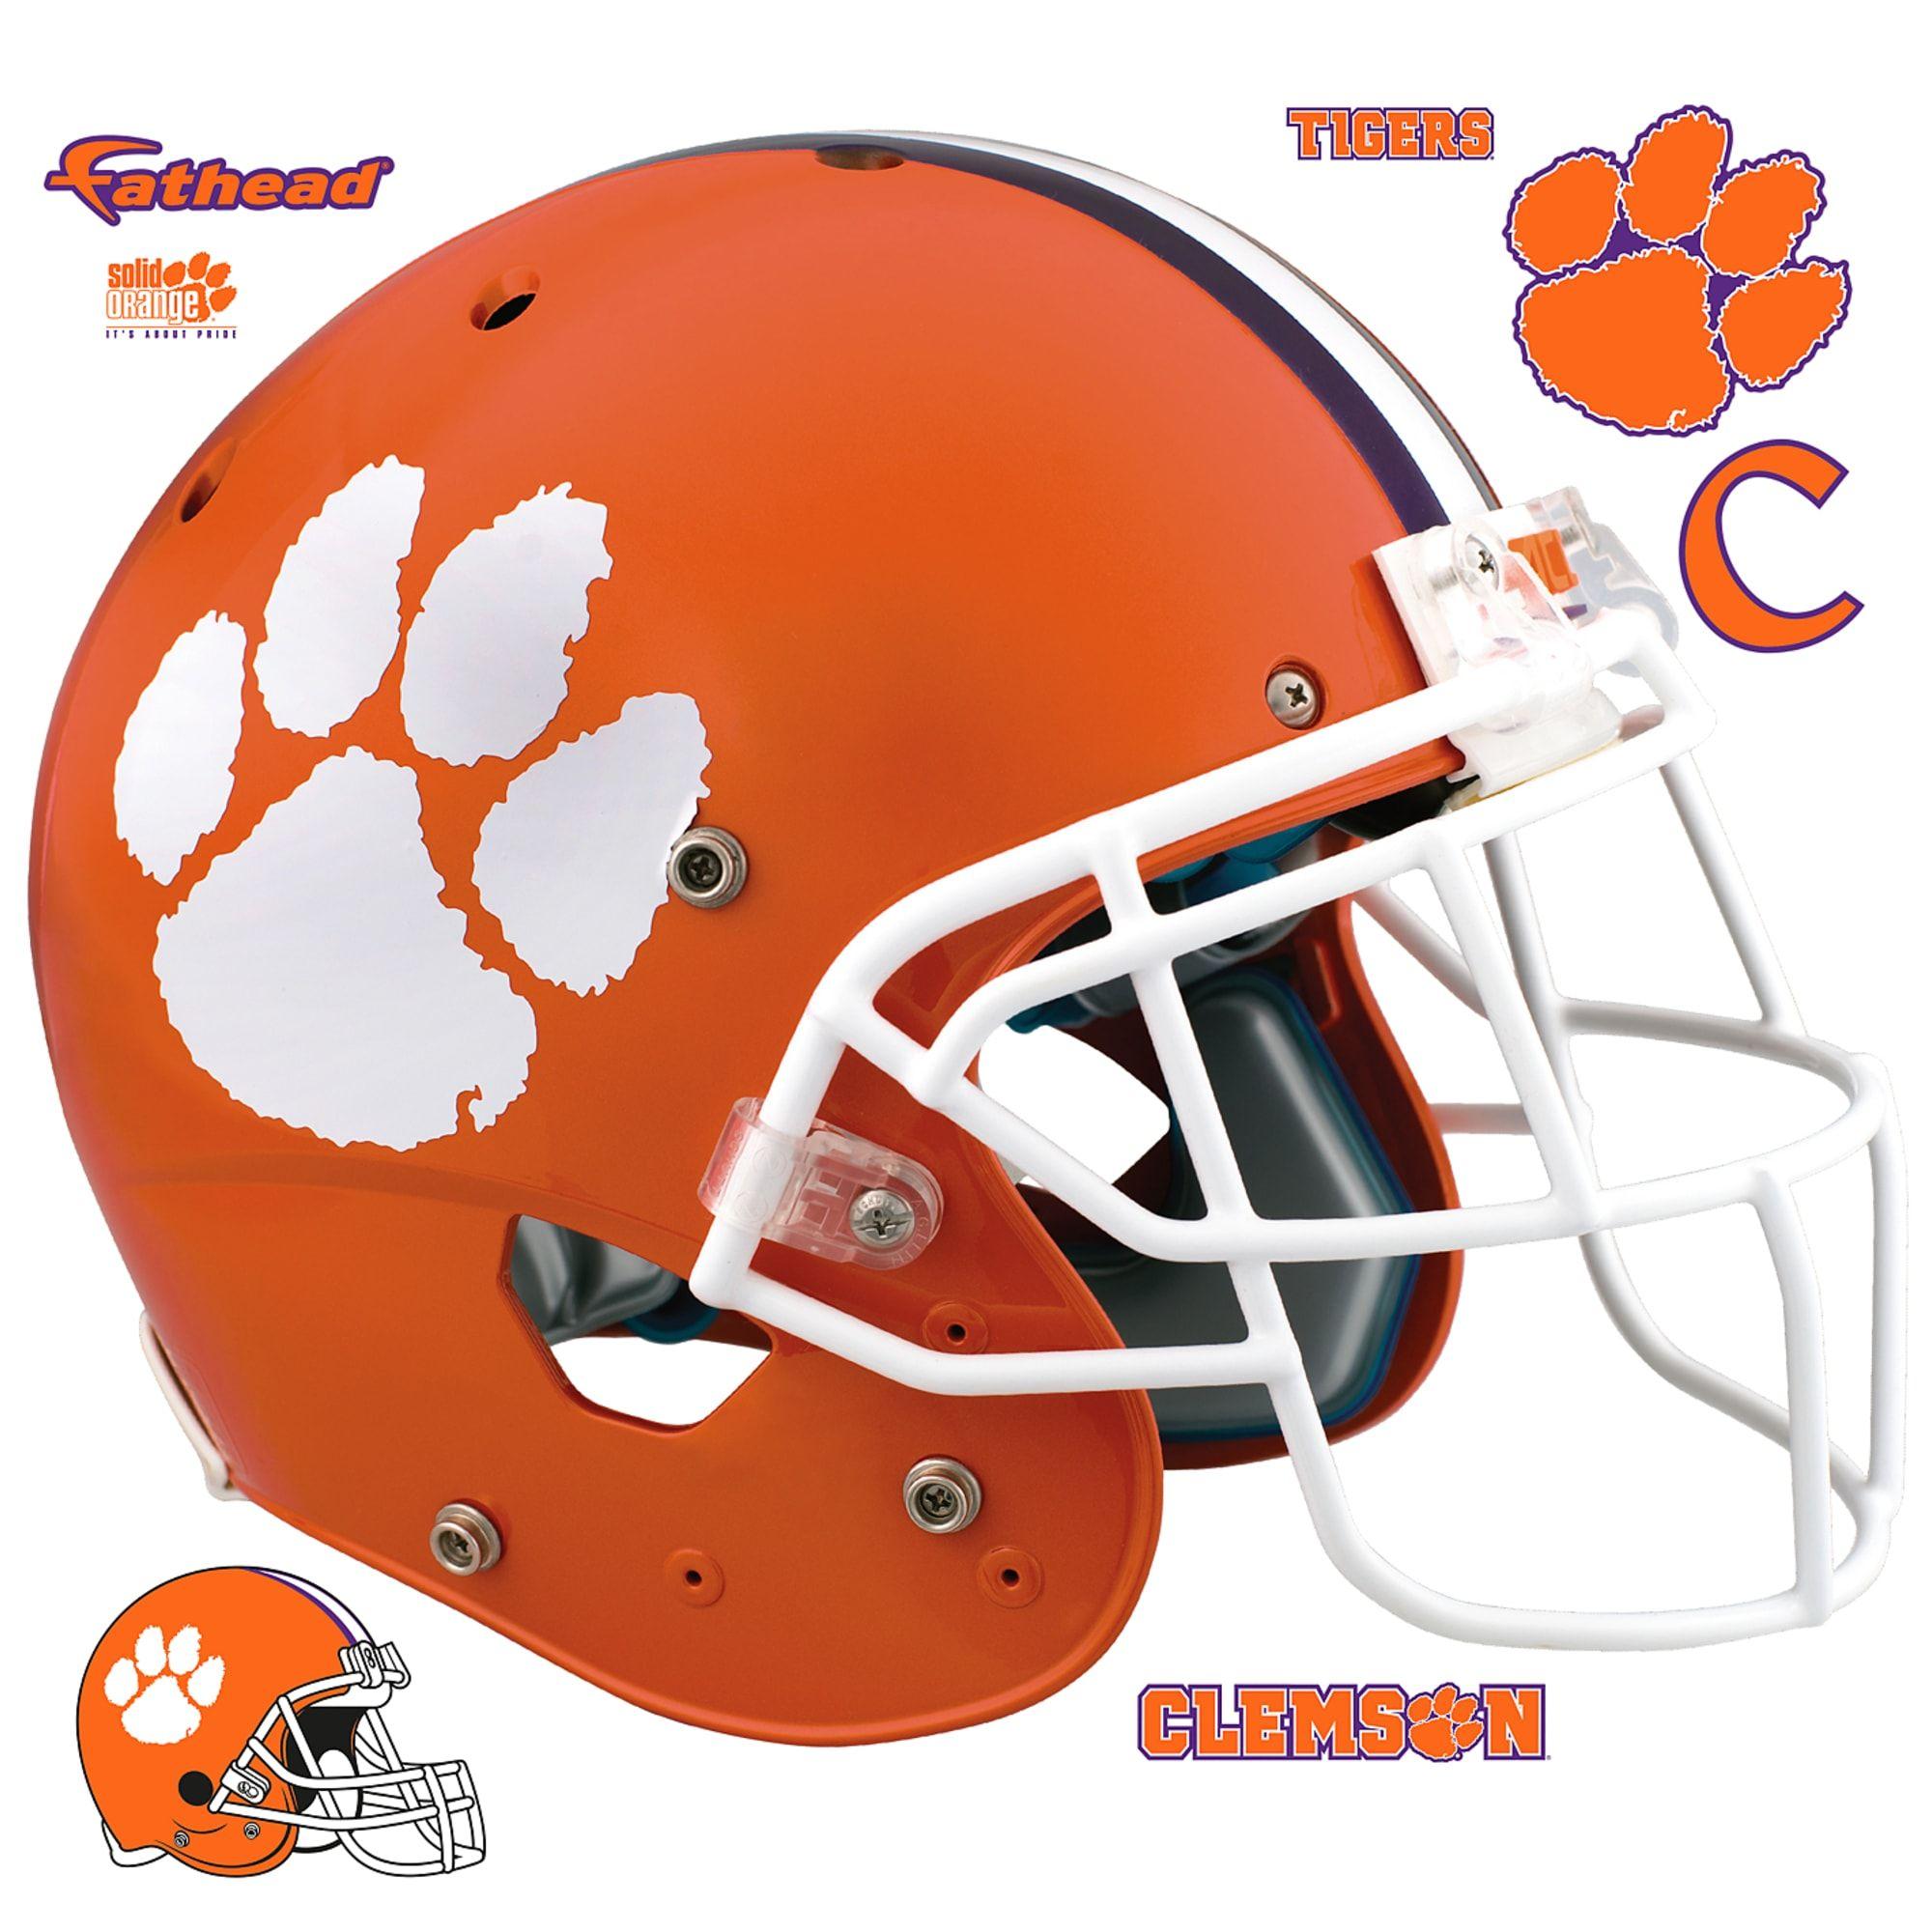 Clemson Tigers Helmet Huge Officially Licensed Removable Wall Decal Removable Wall Decals Clemson Tigers Wall Decals